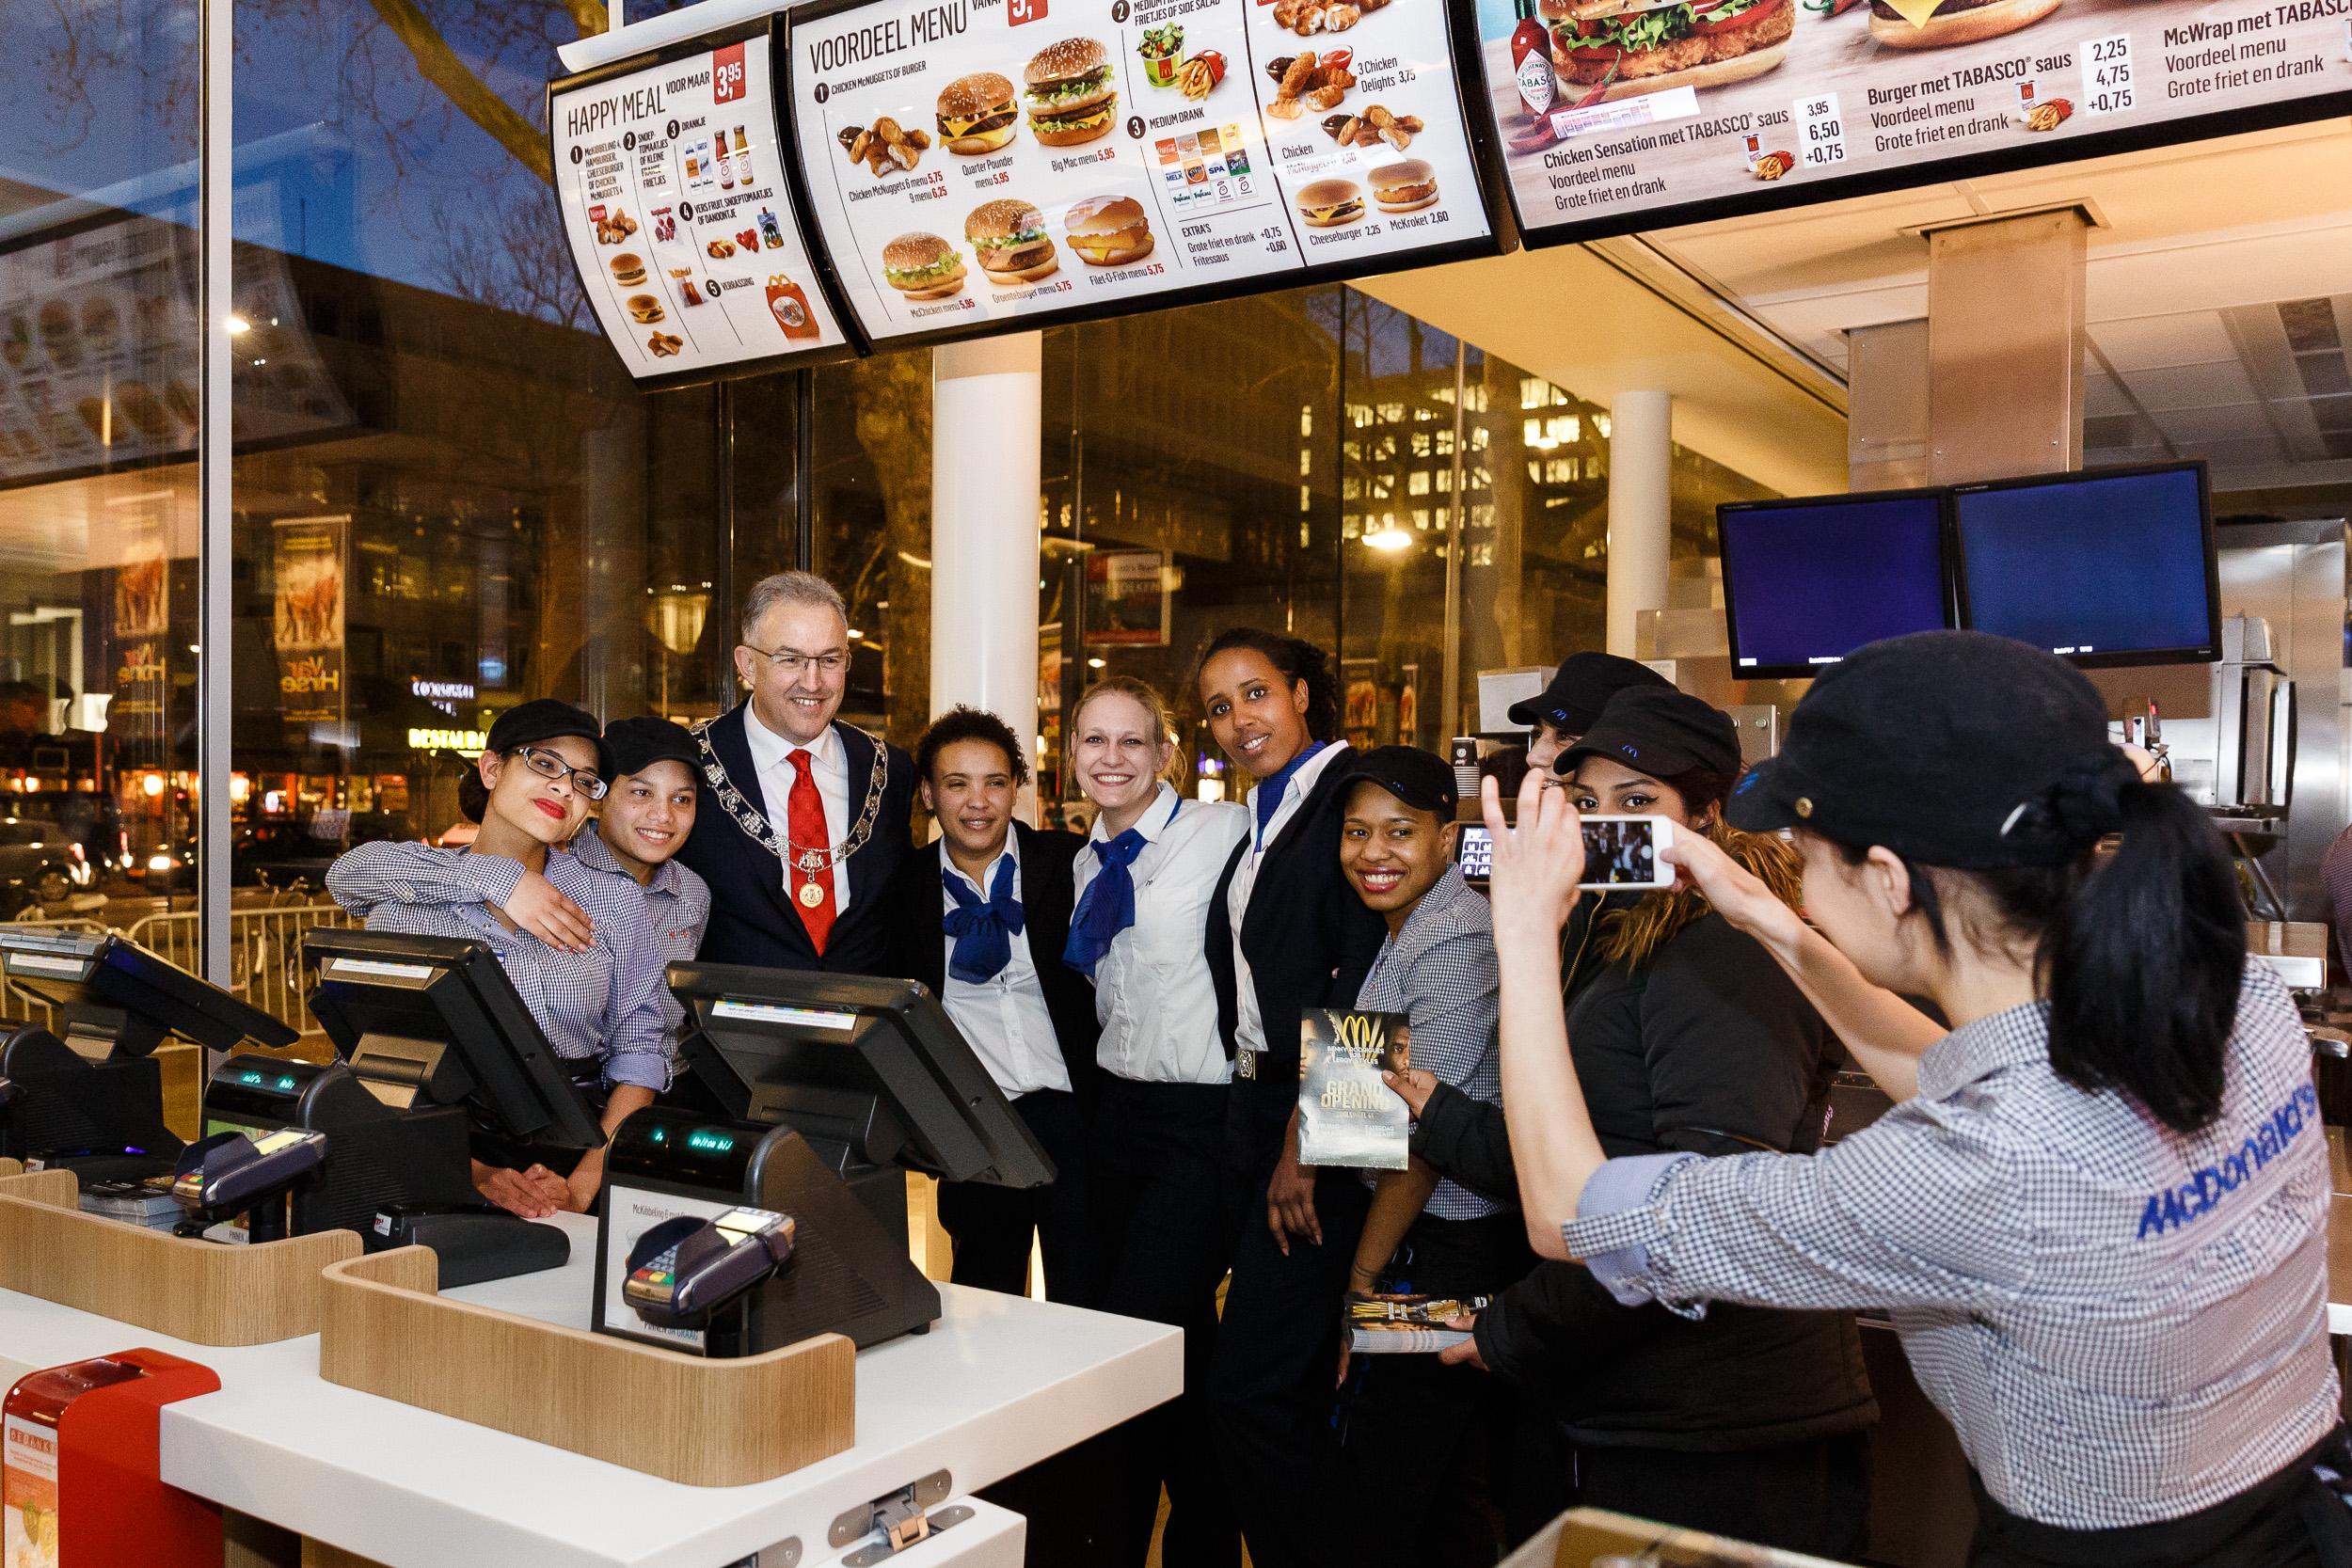 20150327 McDonalds Coolsingel opening 05.jpg